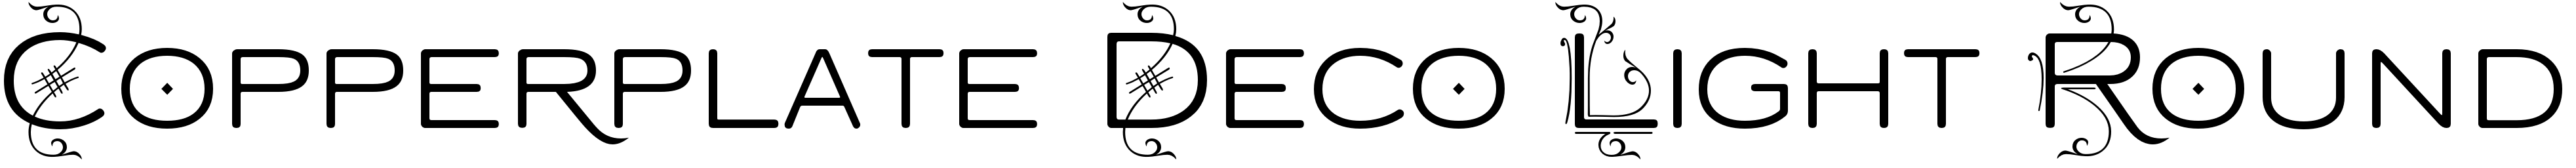 Copperplate Deco Light Round